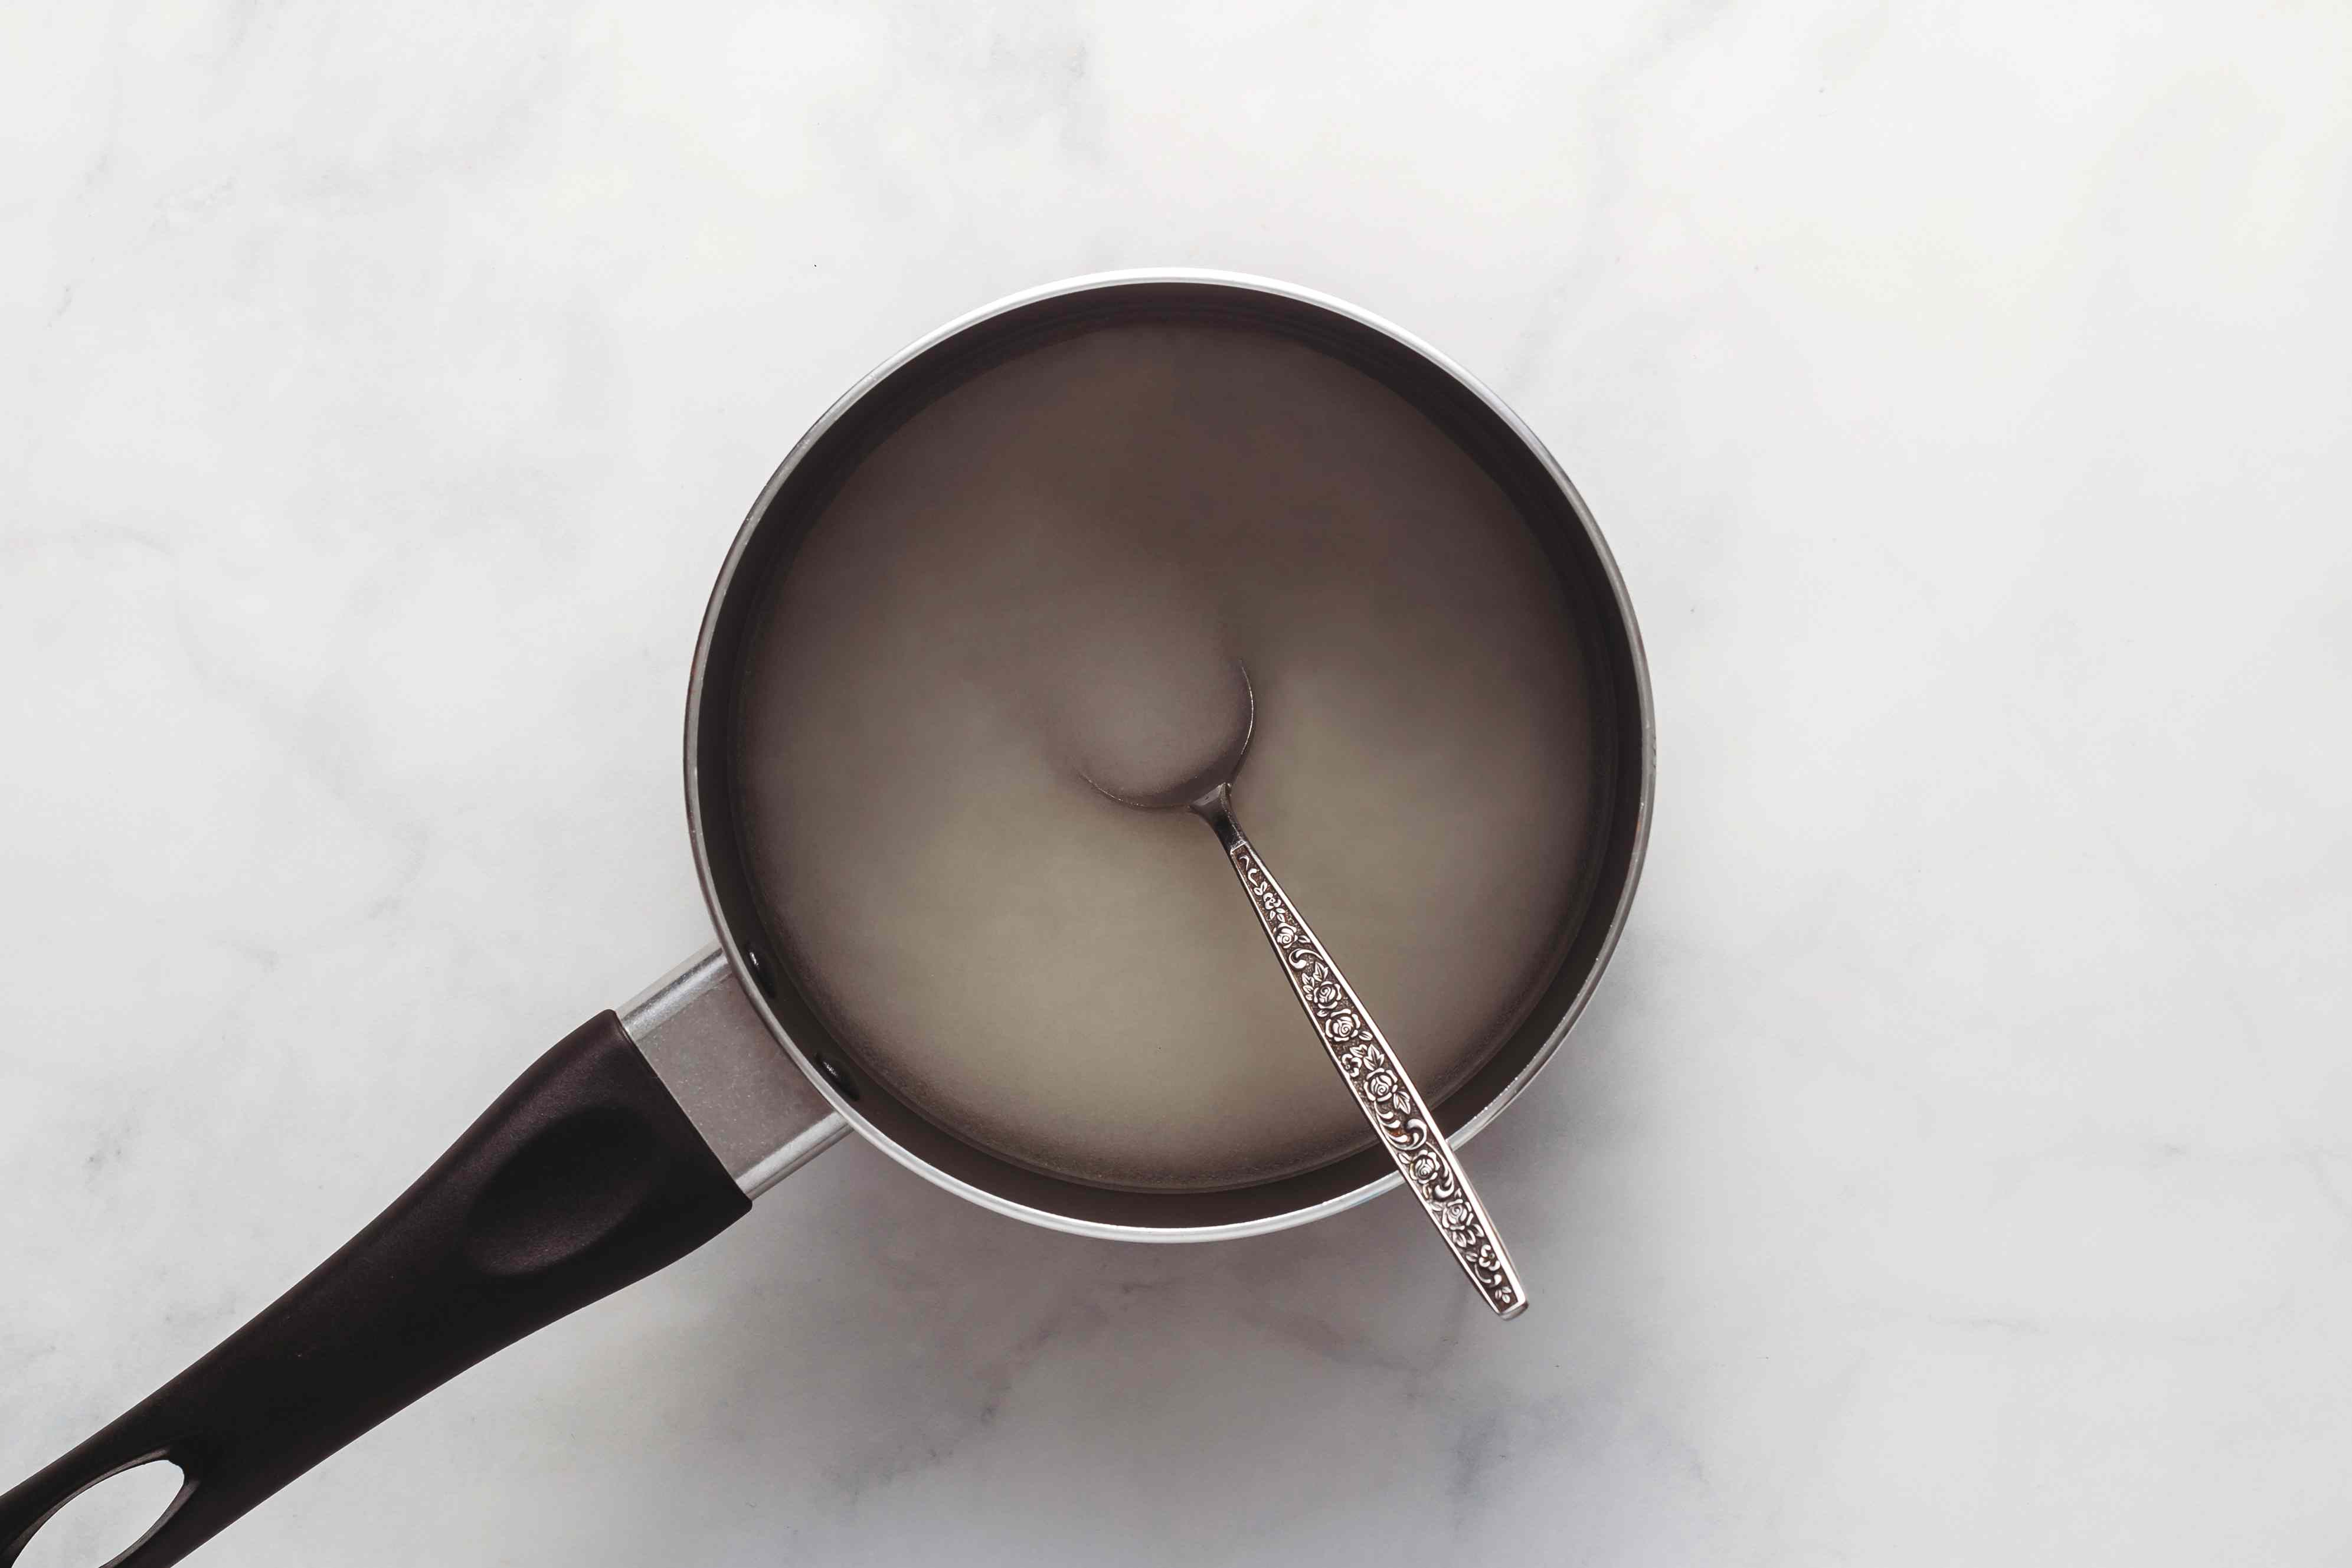 sugar and water mixture in a saucepan